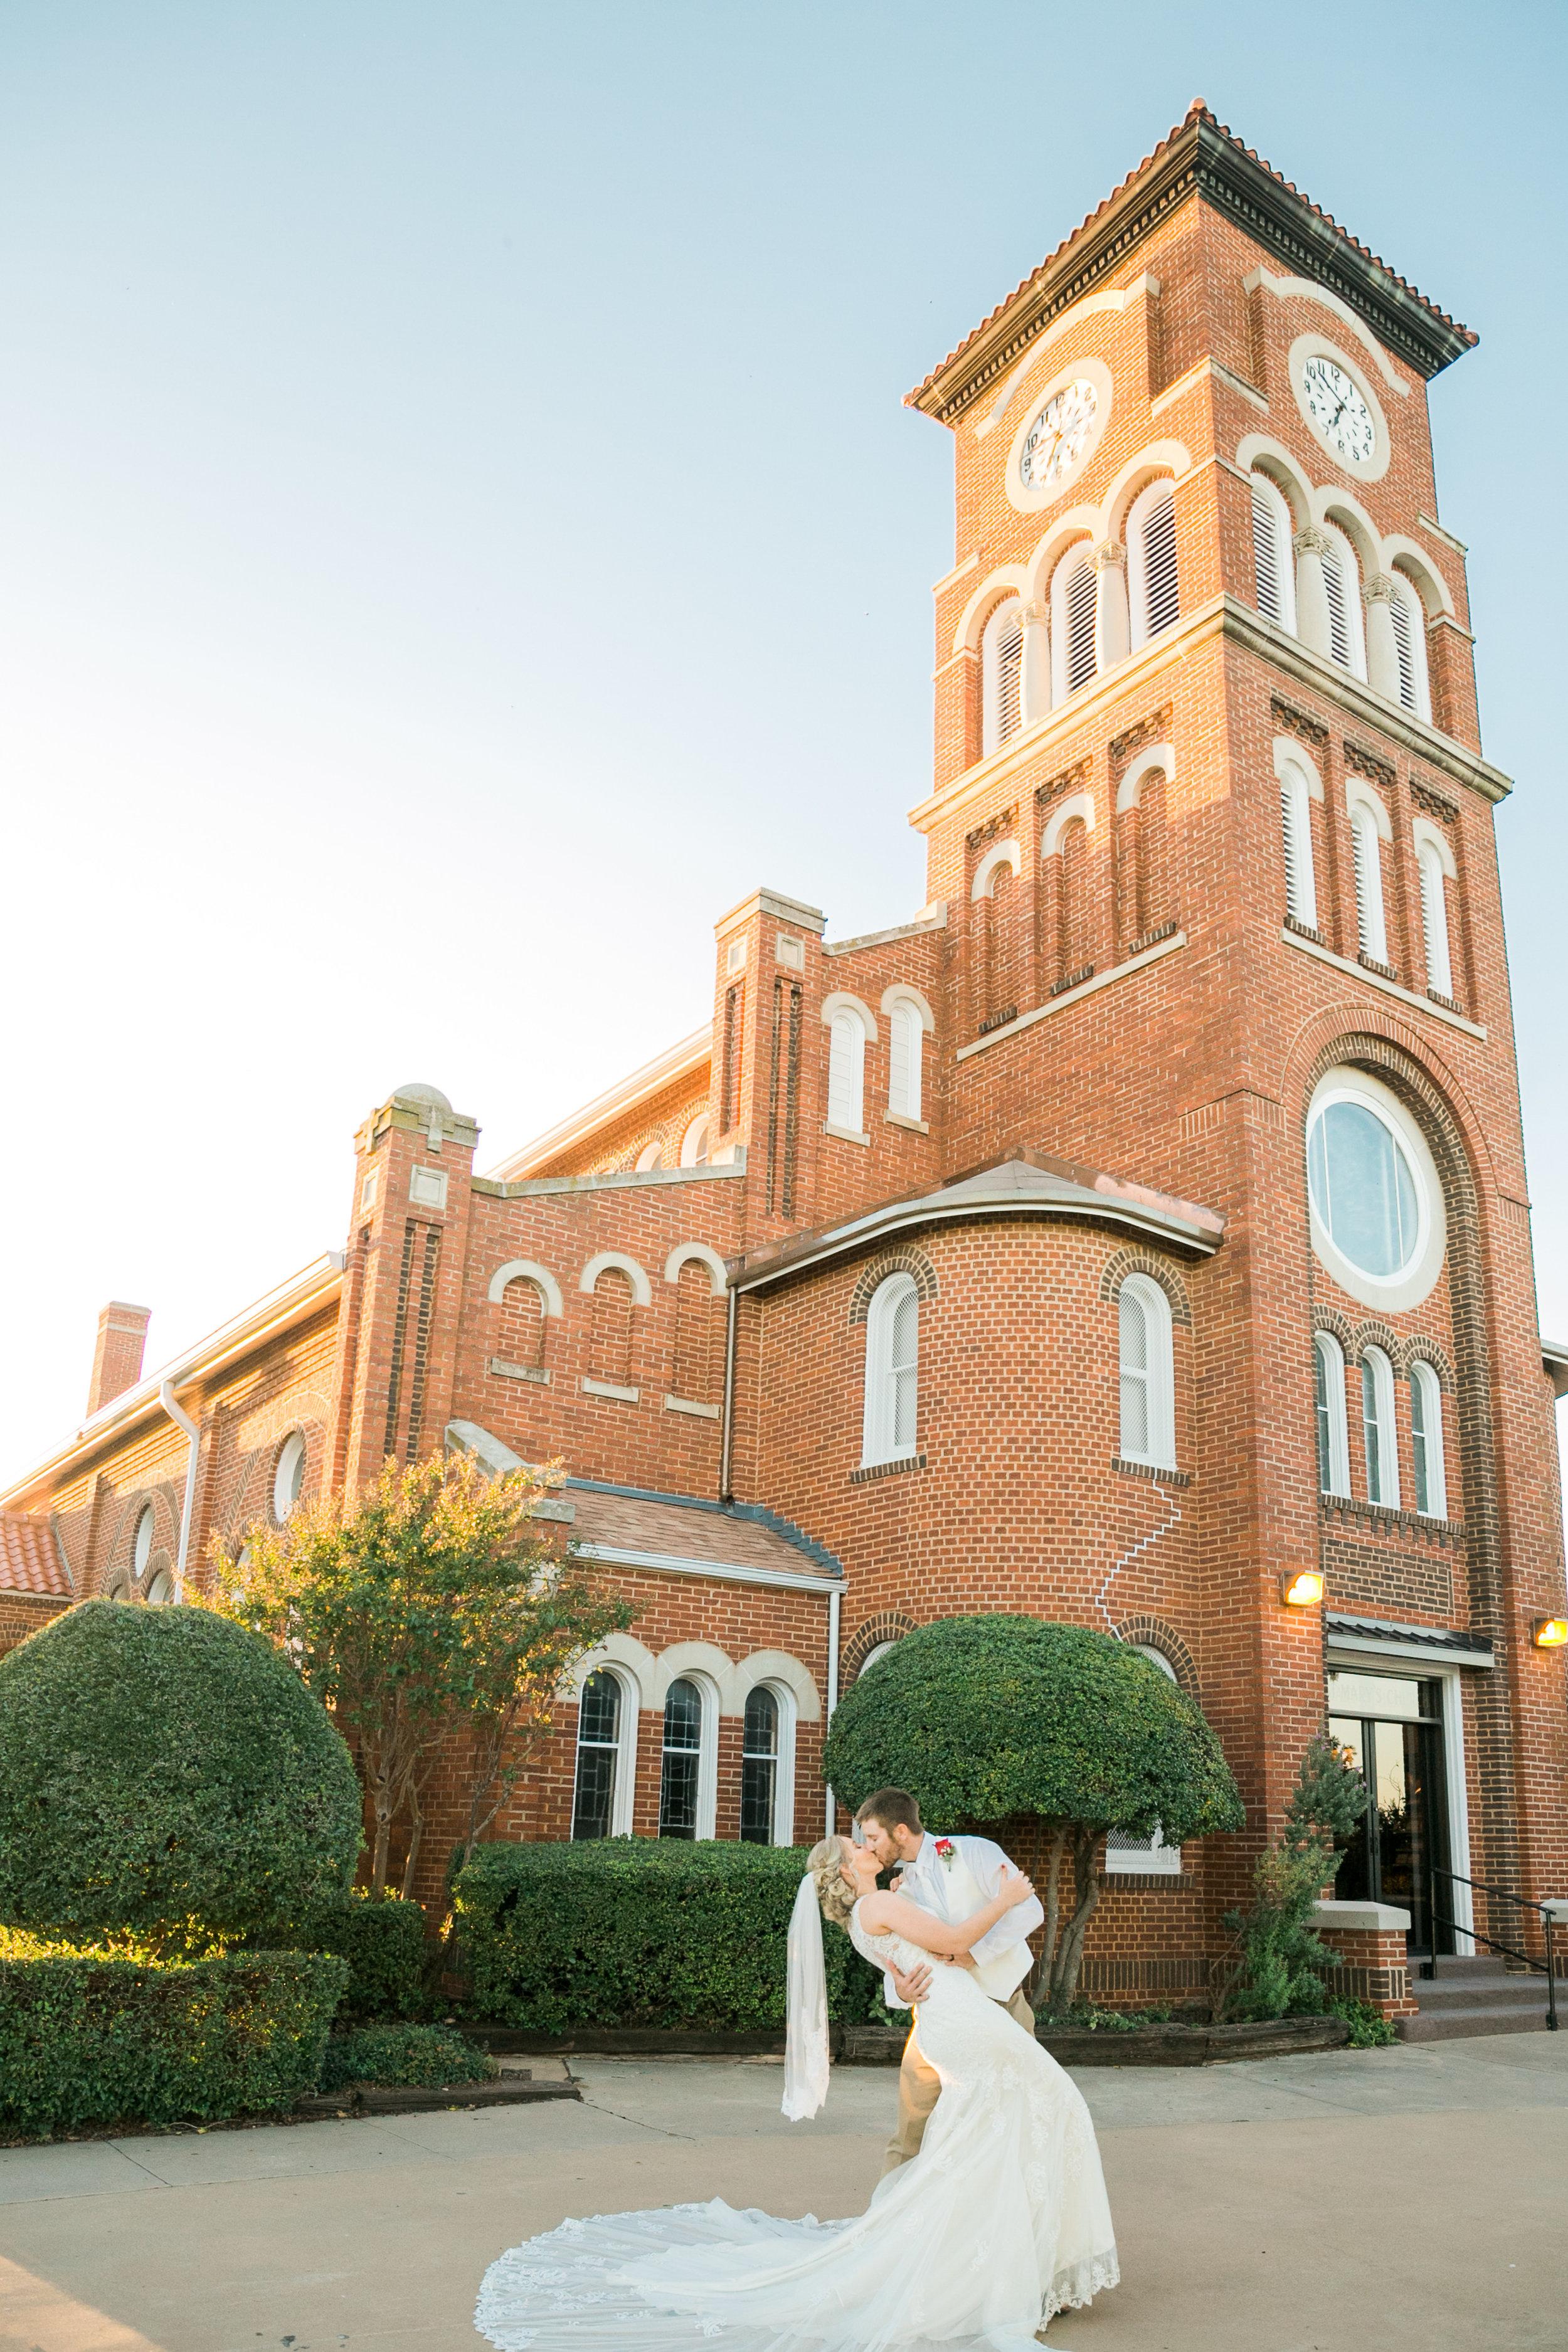 Bailey-Nathan-Windthorst-Texas-Wedding-055.jpg